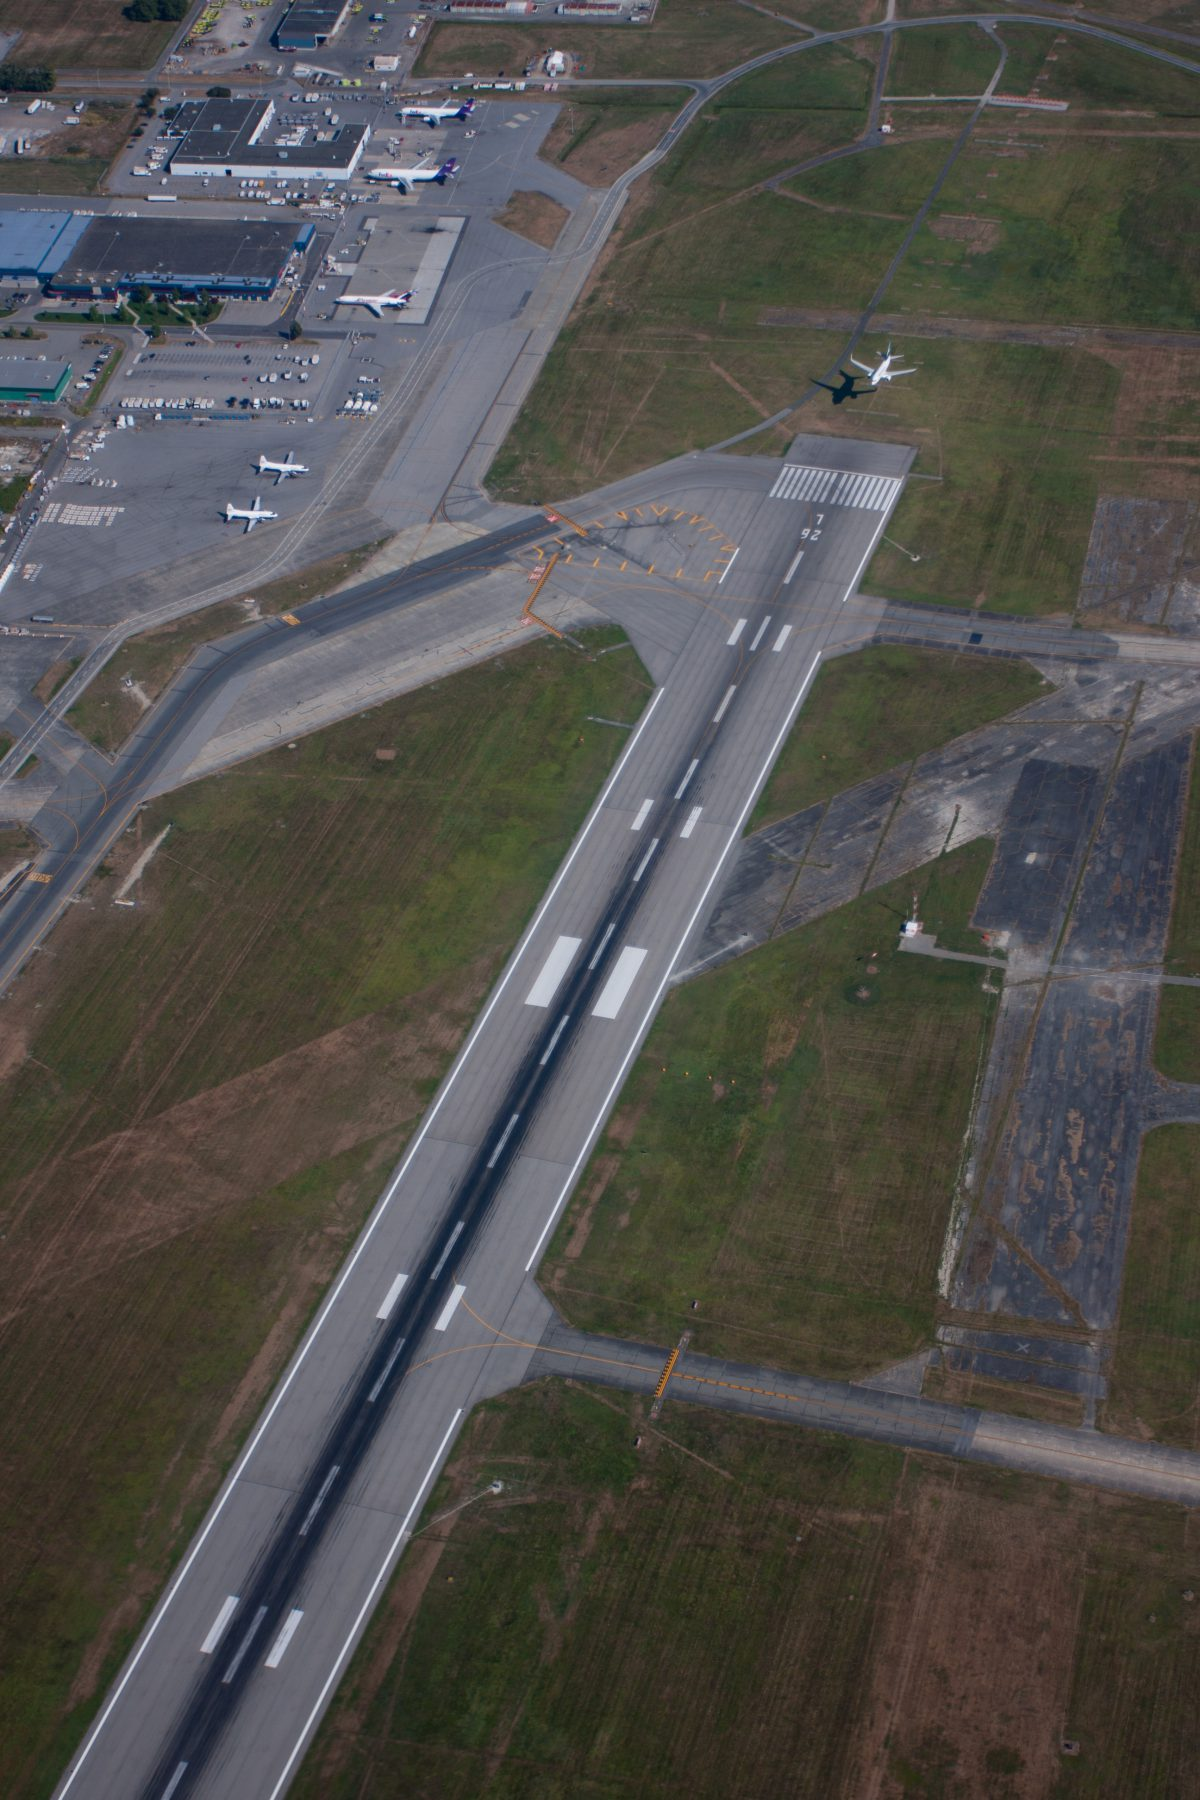 Landing, seaplane, plane, airport, flight